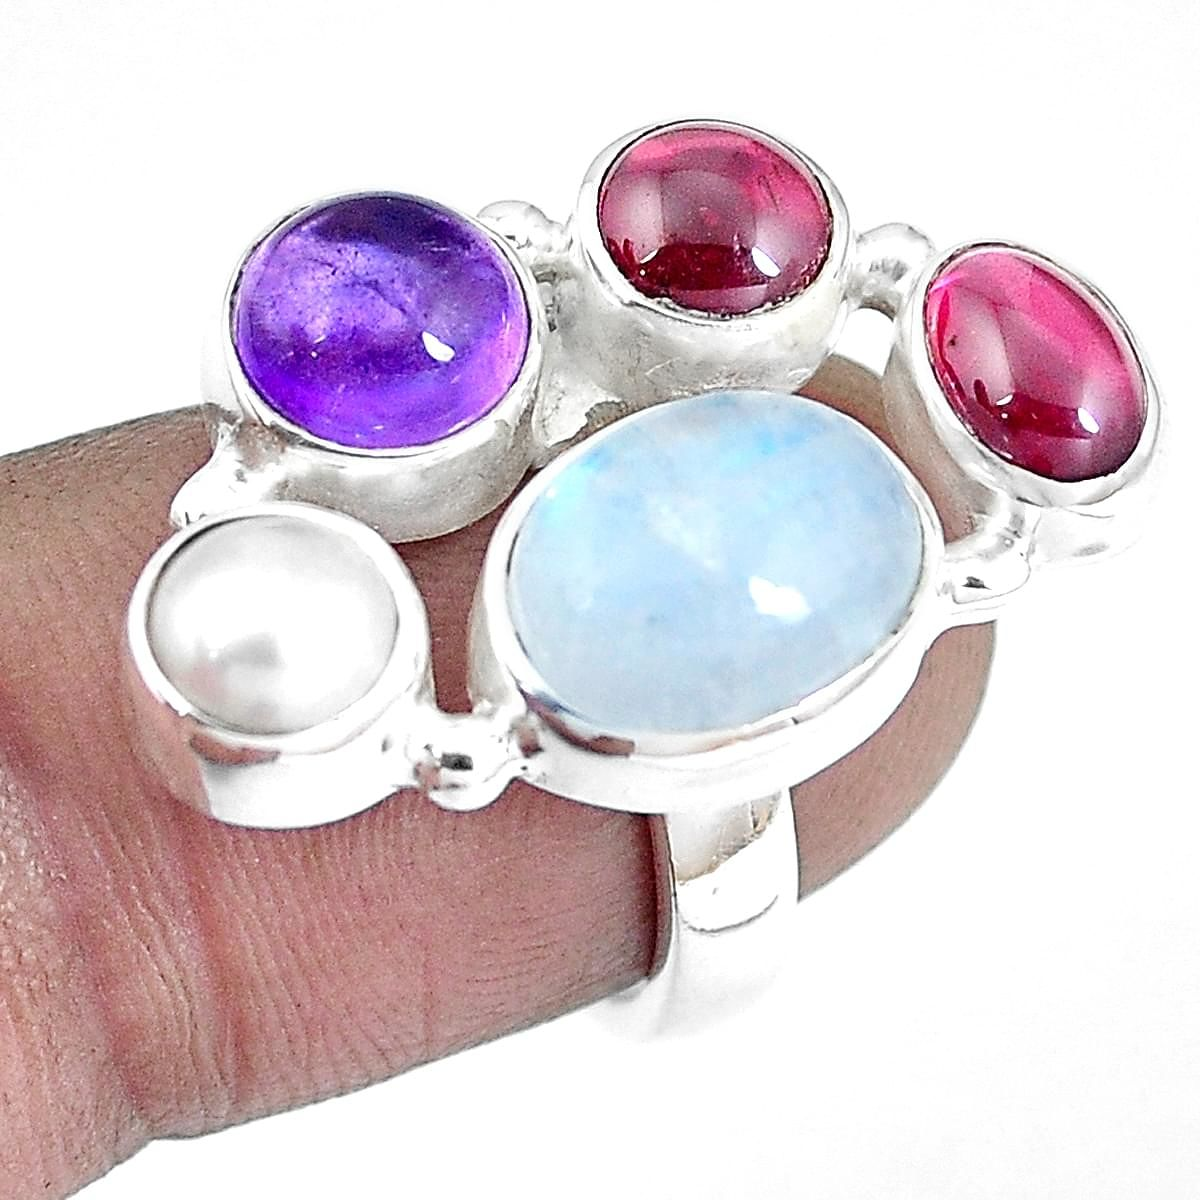 Natural Rainbow Moonstone and Amethyst silver ring